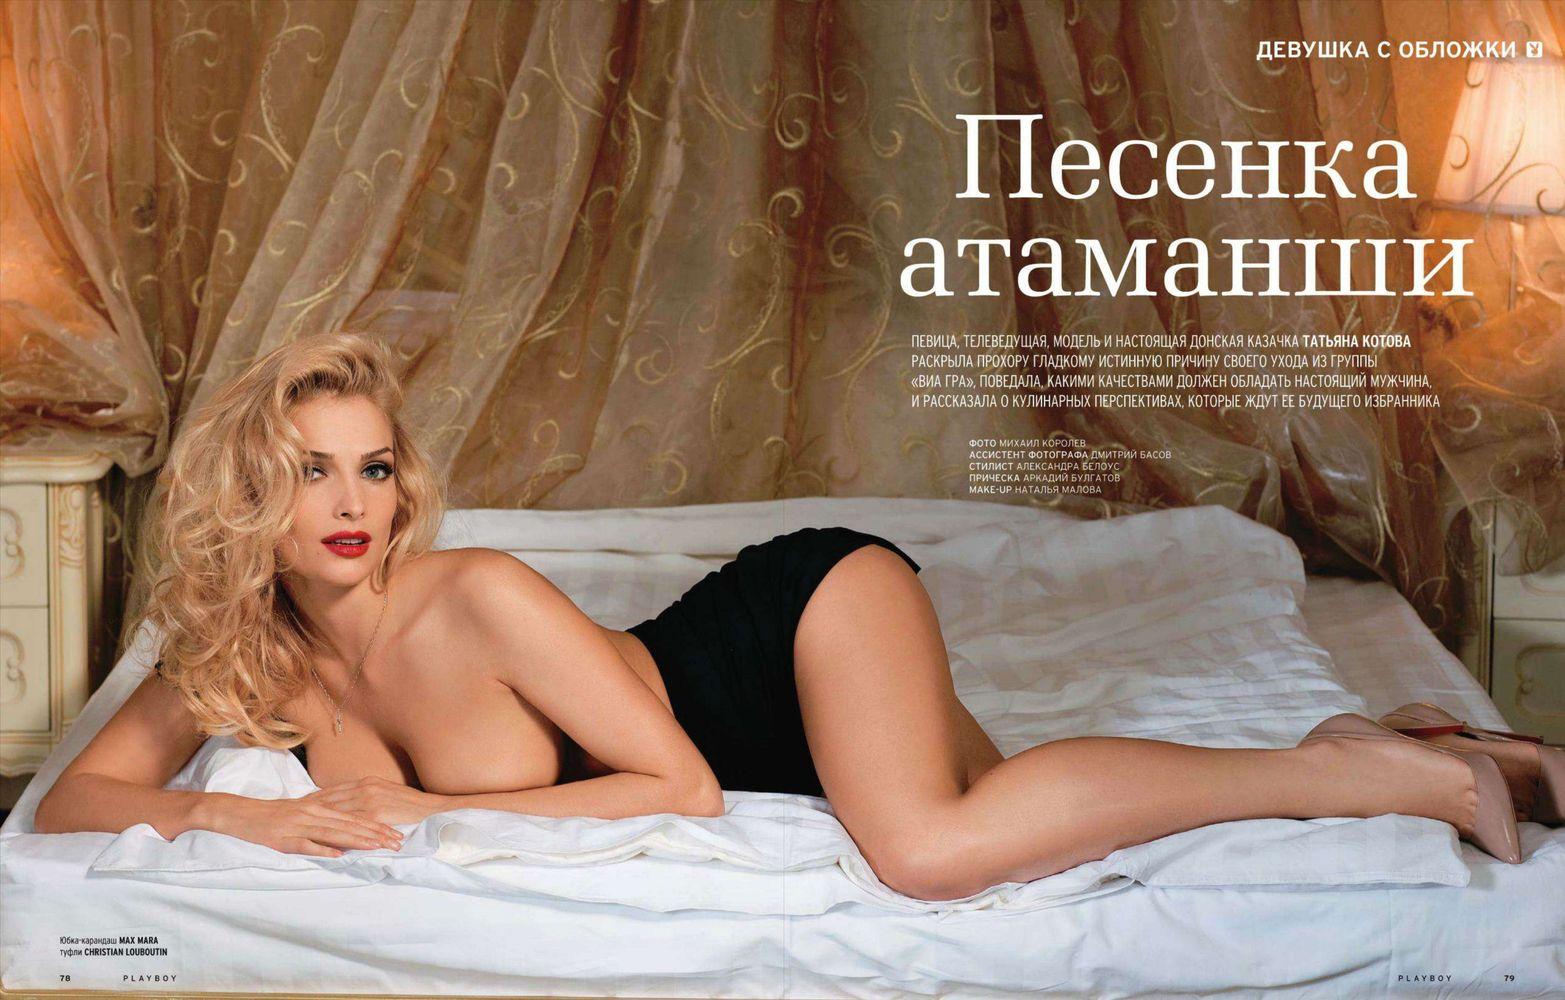 Татьяна котова про секс 12 фотография